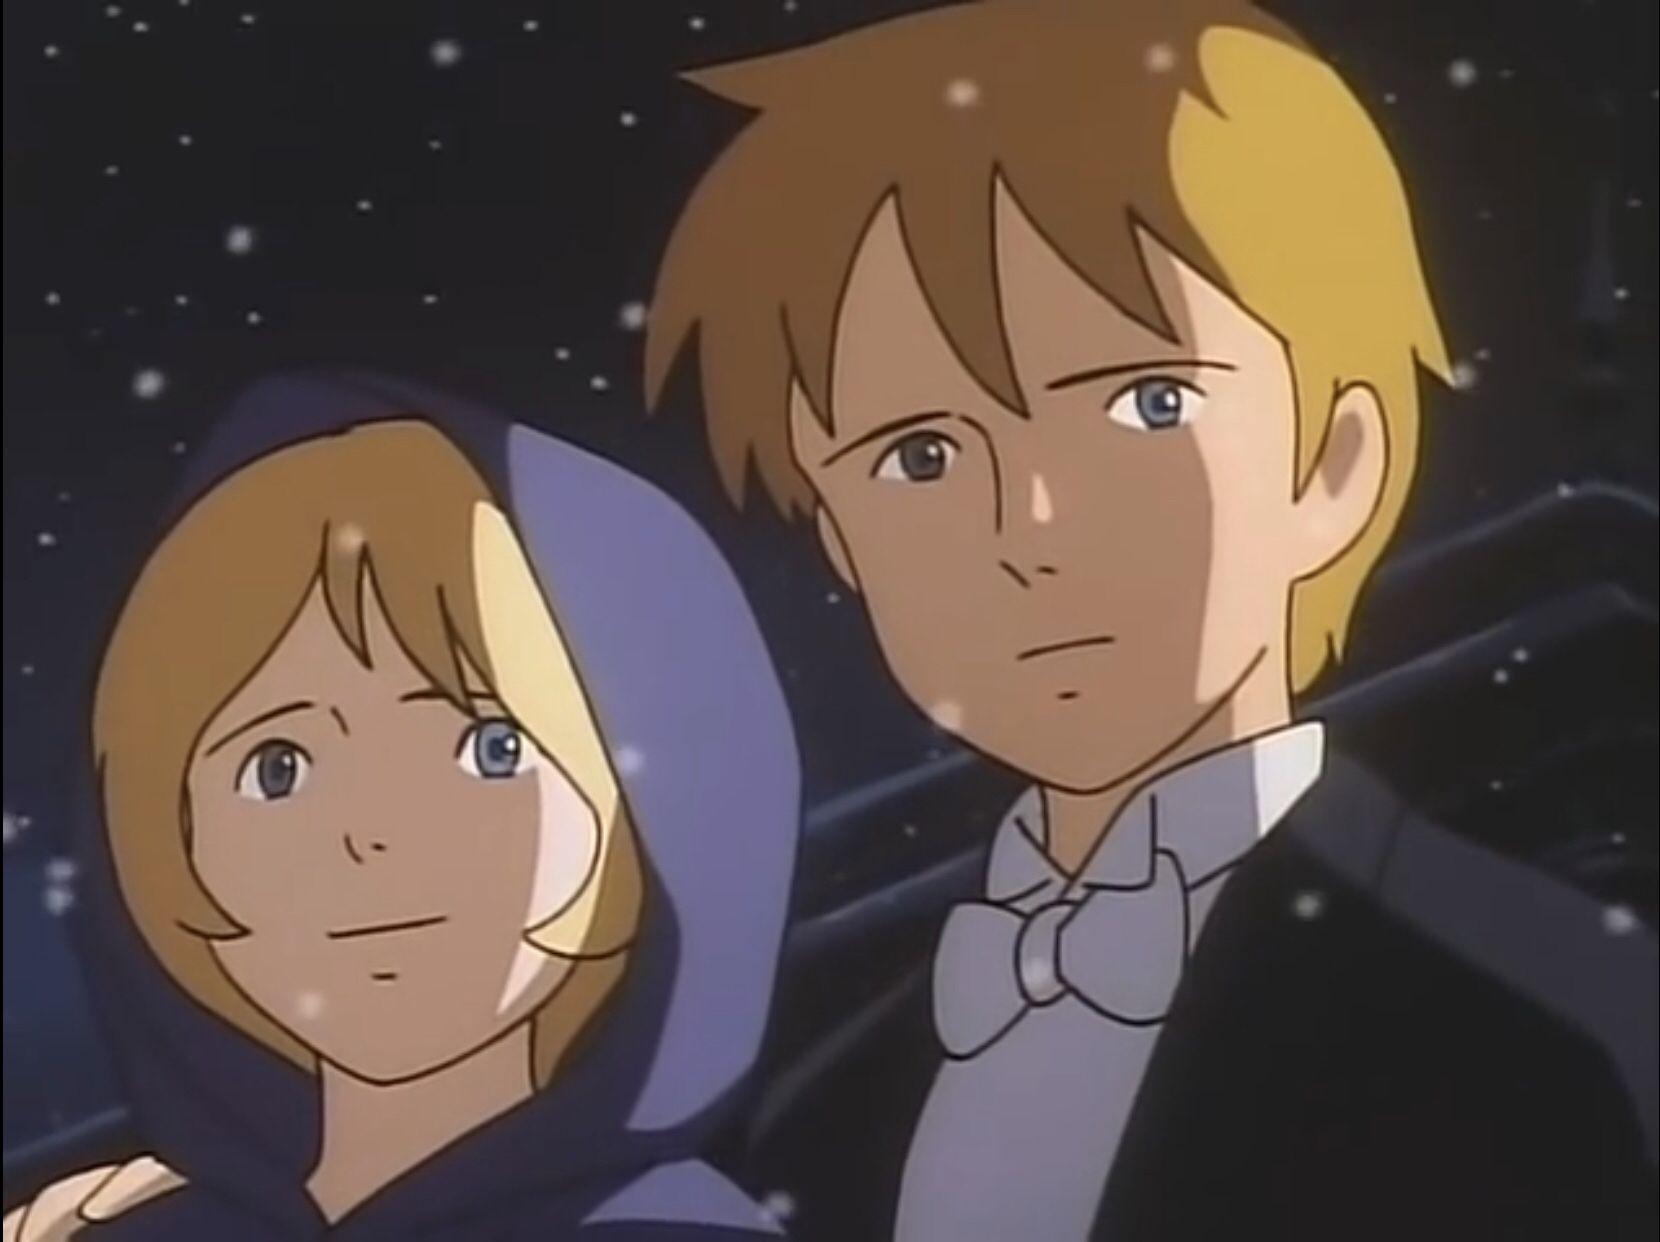 عهد الأصدقاء Old Anime Anatomy Art Cute Anime Boy